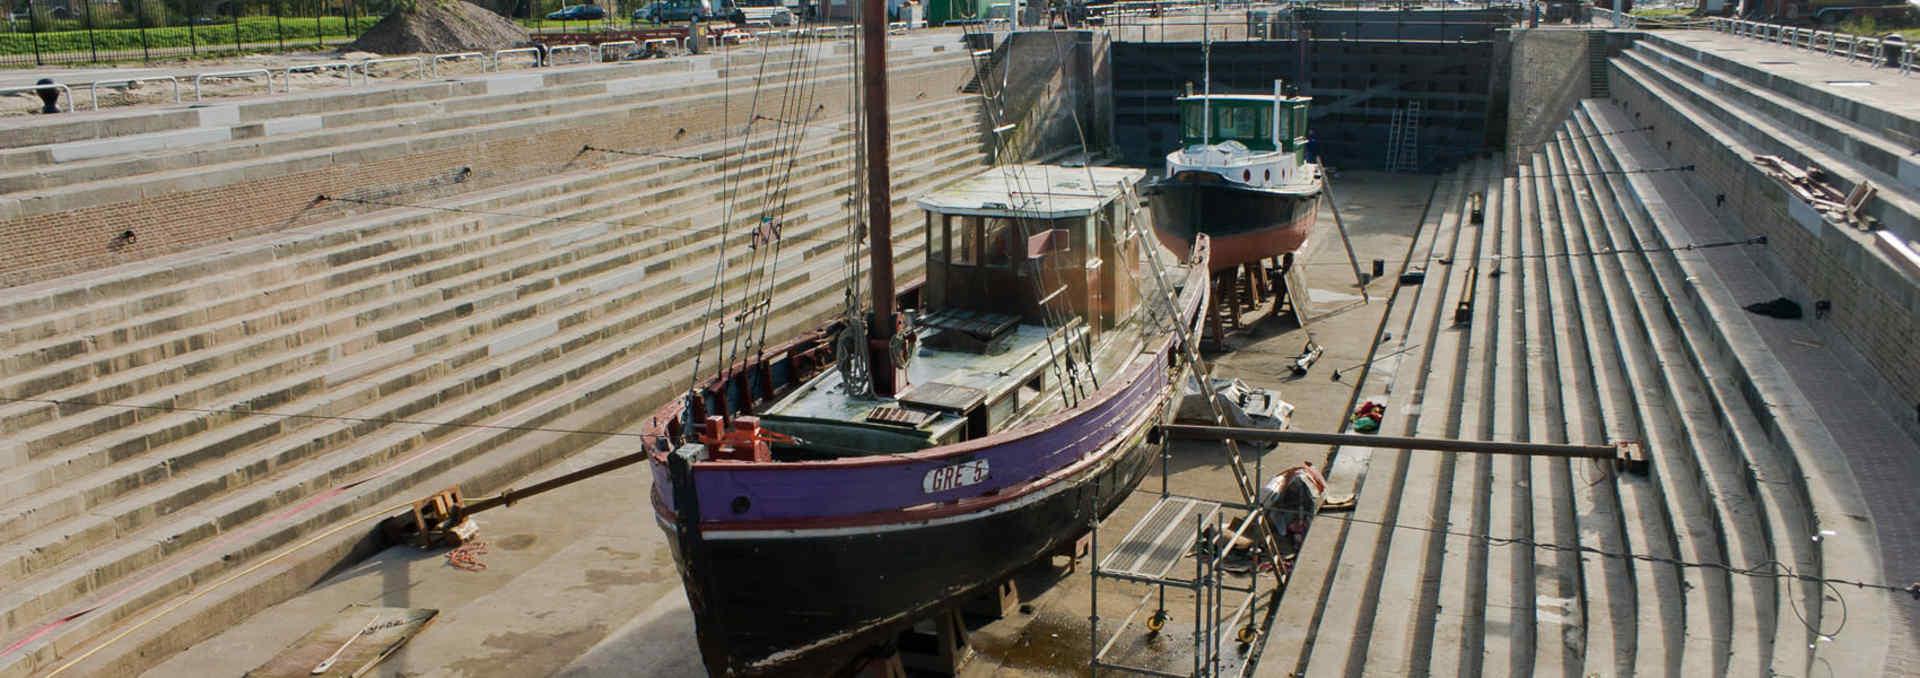 Dry dock Jan Blanken